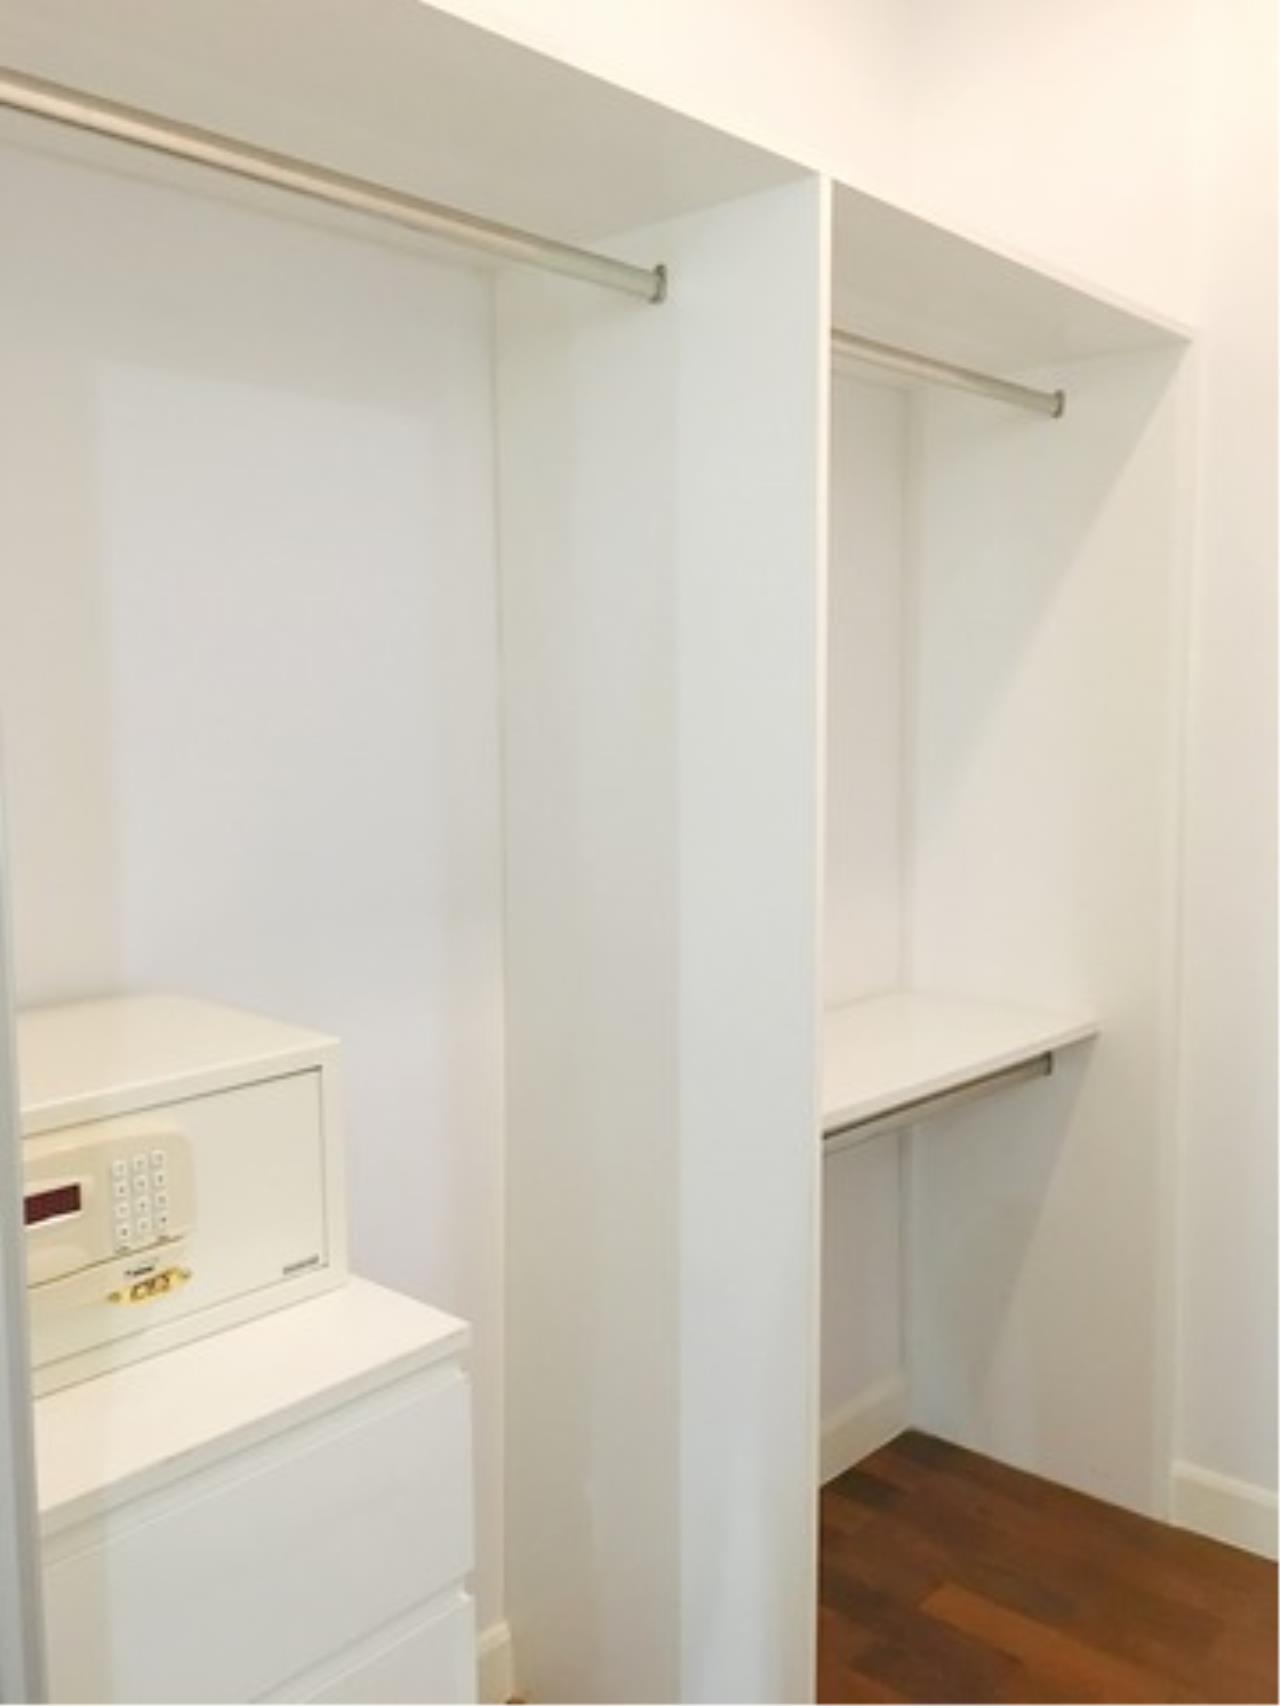 Ta (+66 9 5935 1592) Agency's SALE Condo Siri Residence by Sansiri 2 Bed near BTS Prompong Thonglor Emporium Best Price (163,000B/sqm) 7